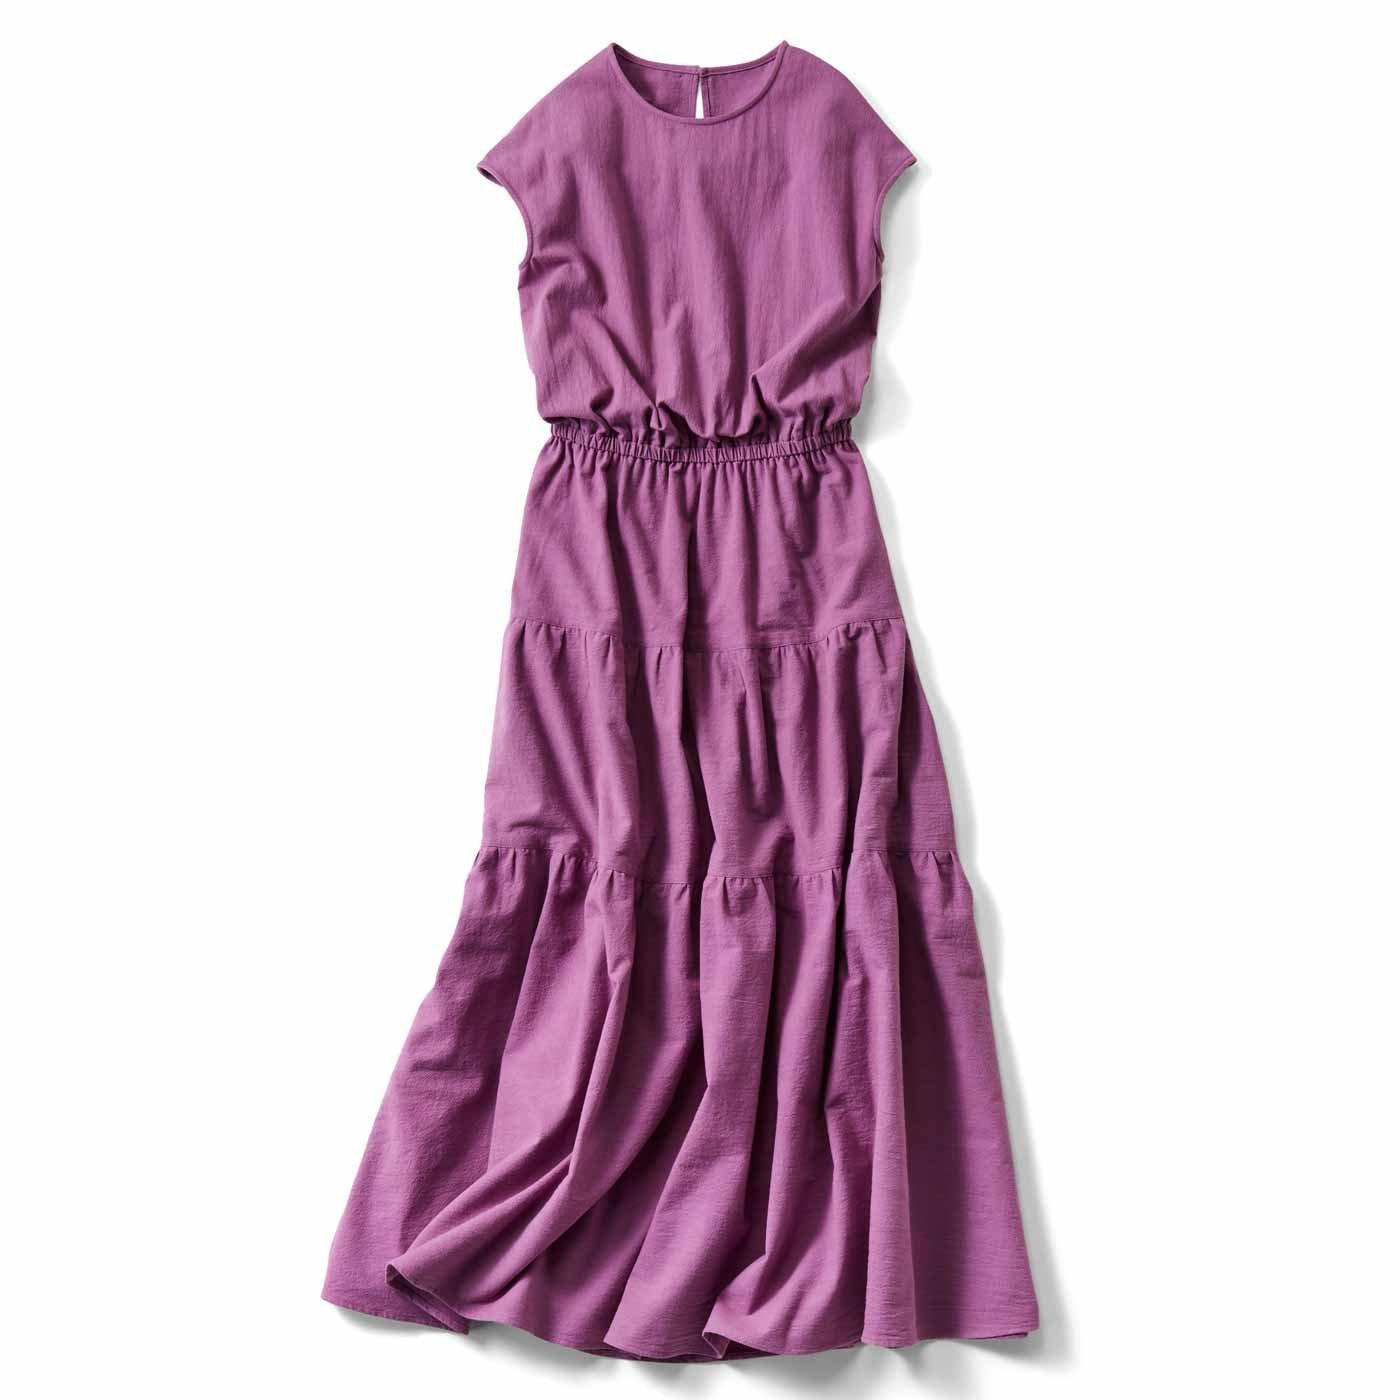 IEDIT[イディット] ティアードデザインの大人サマードレス〈ピンクパープル〉